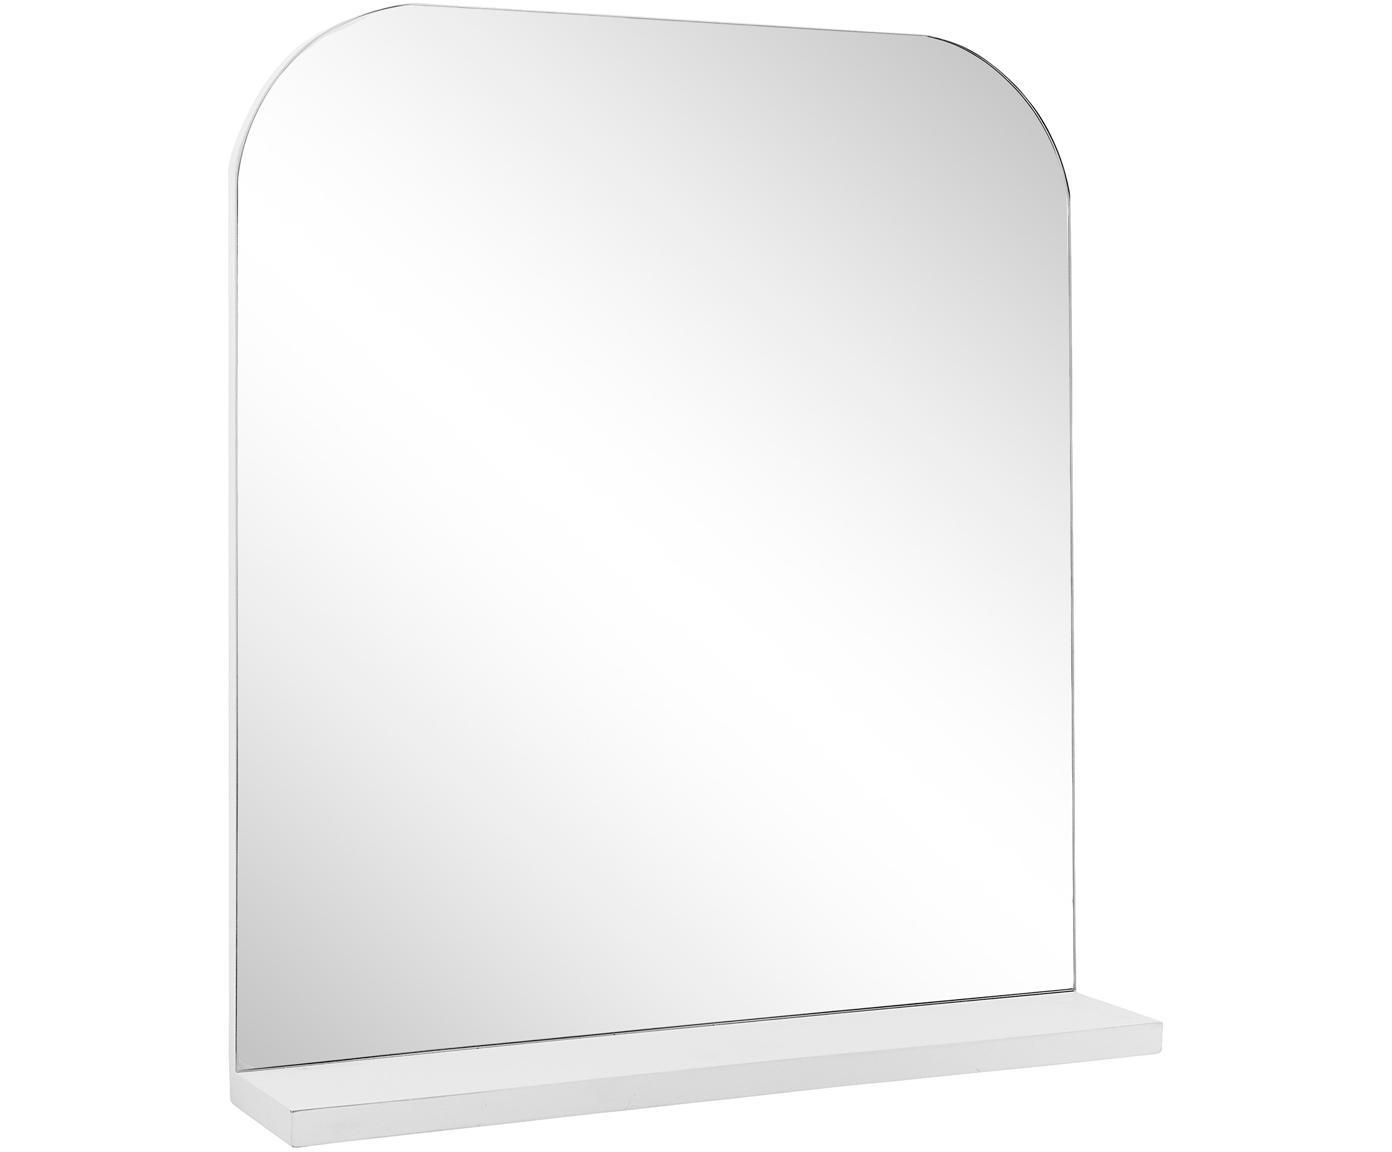 Espejo de pared Pina, Estante: madera, Espejo: cristal, Blanco, An 55 x Al 63 cm